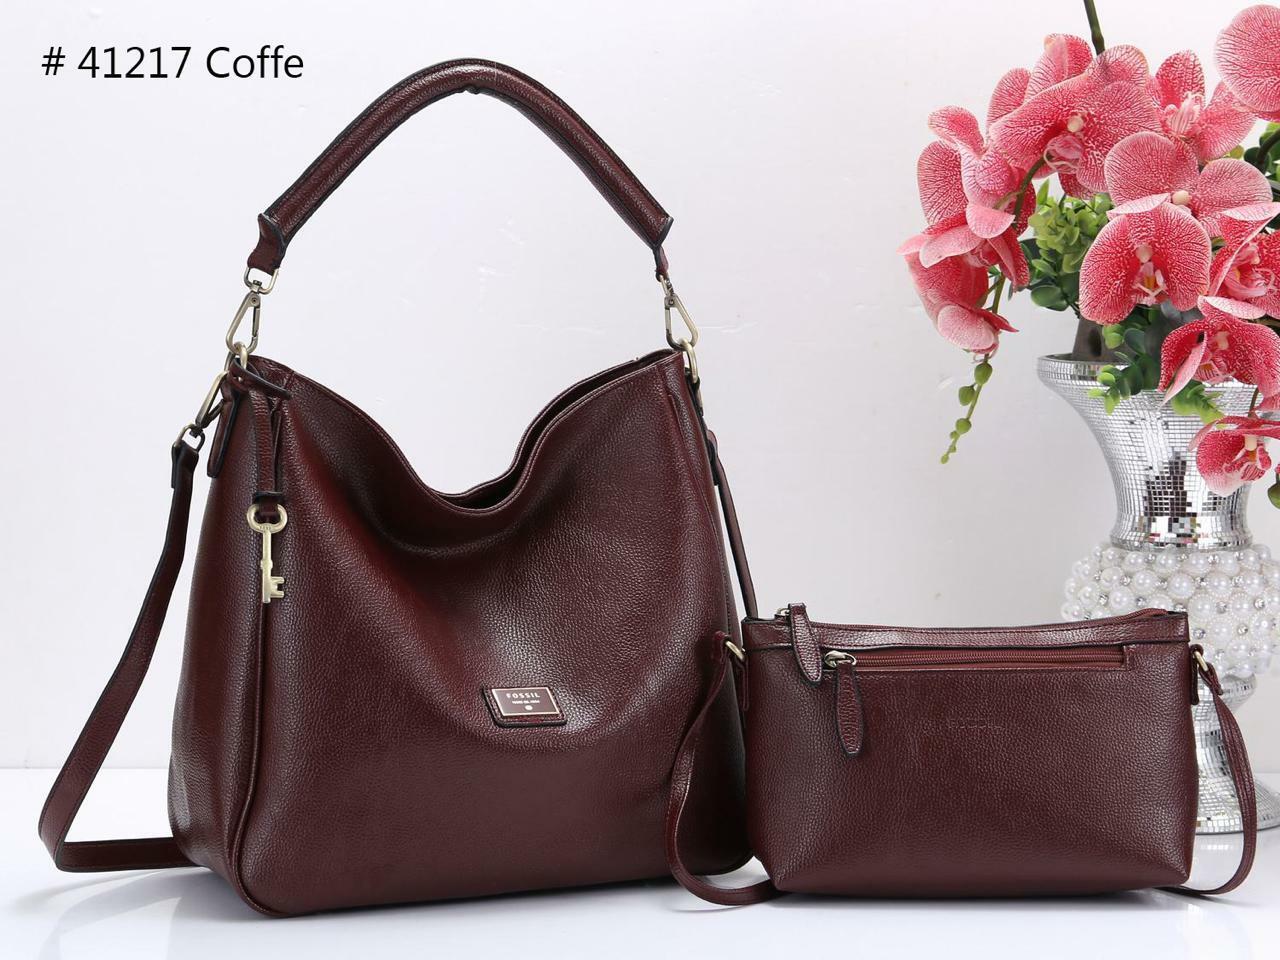 tas wanita fossil shopie hobo tote bag branded import fashion kerja casual  set slingbag santai batam 413a6143bf